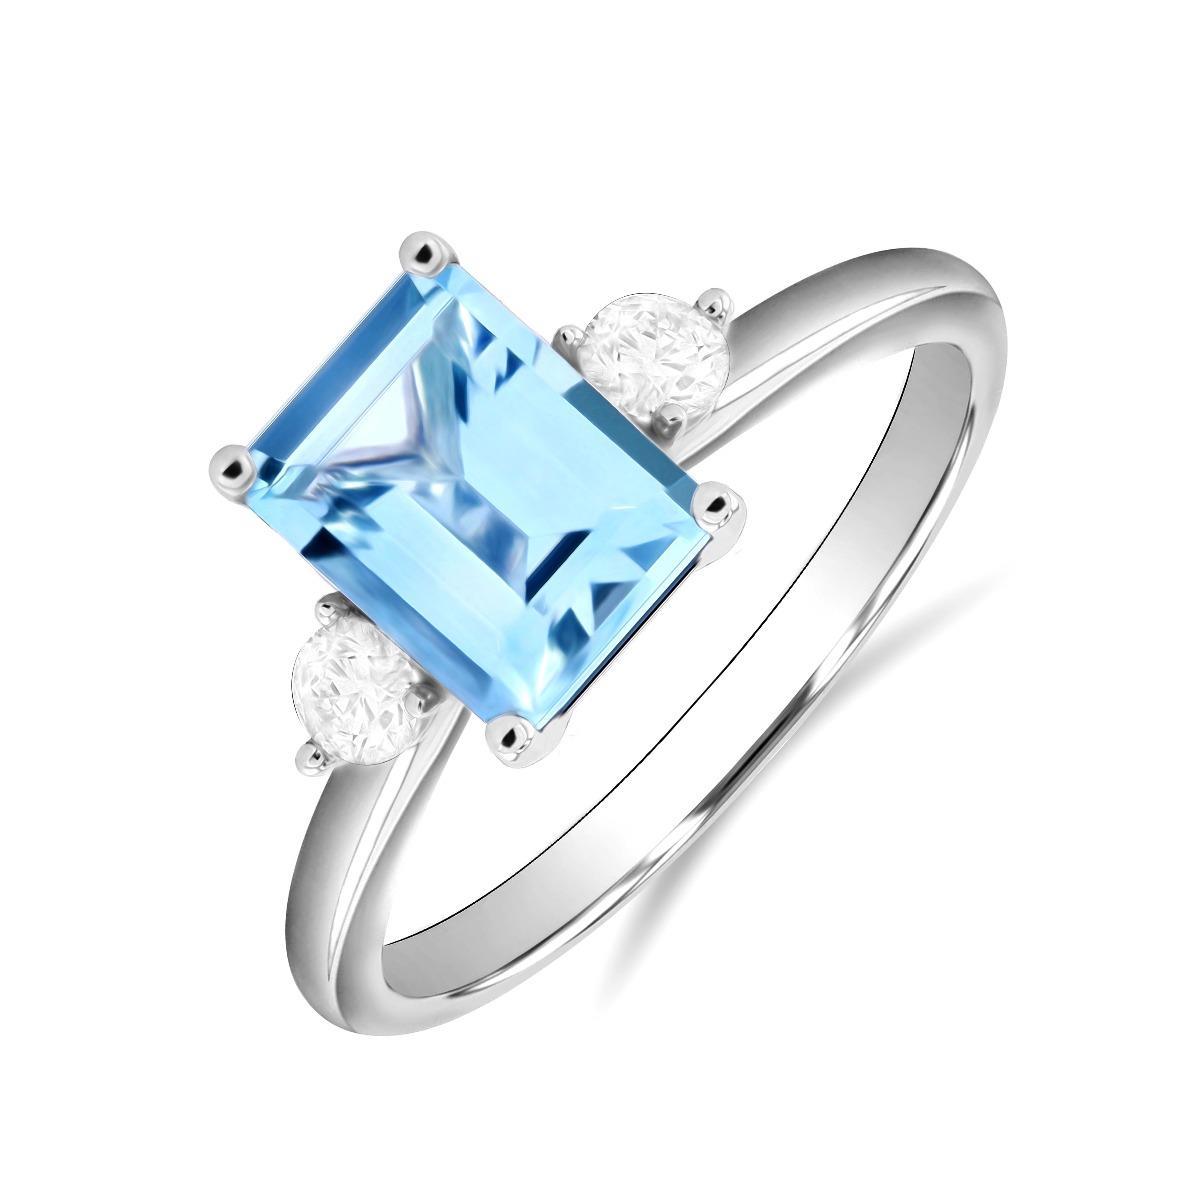 Rosa Mer Collection 1.44ct Aquamarine & Diamond Ring